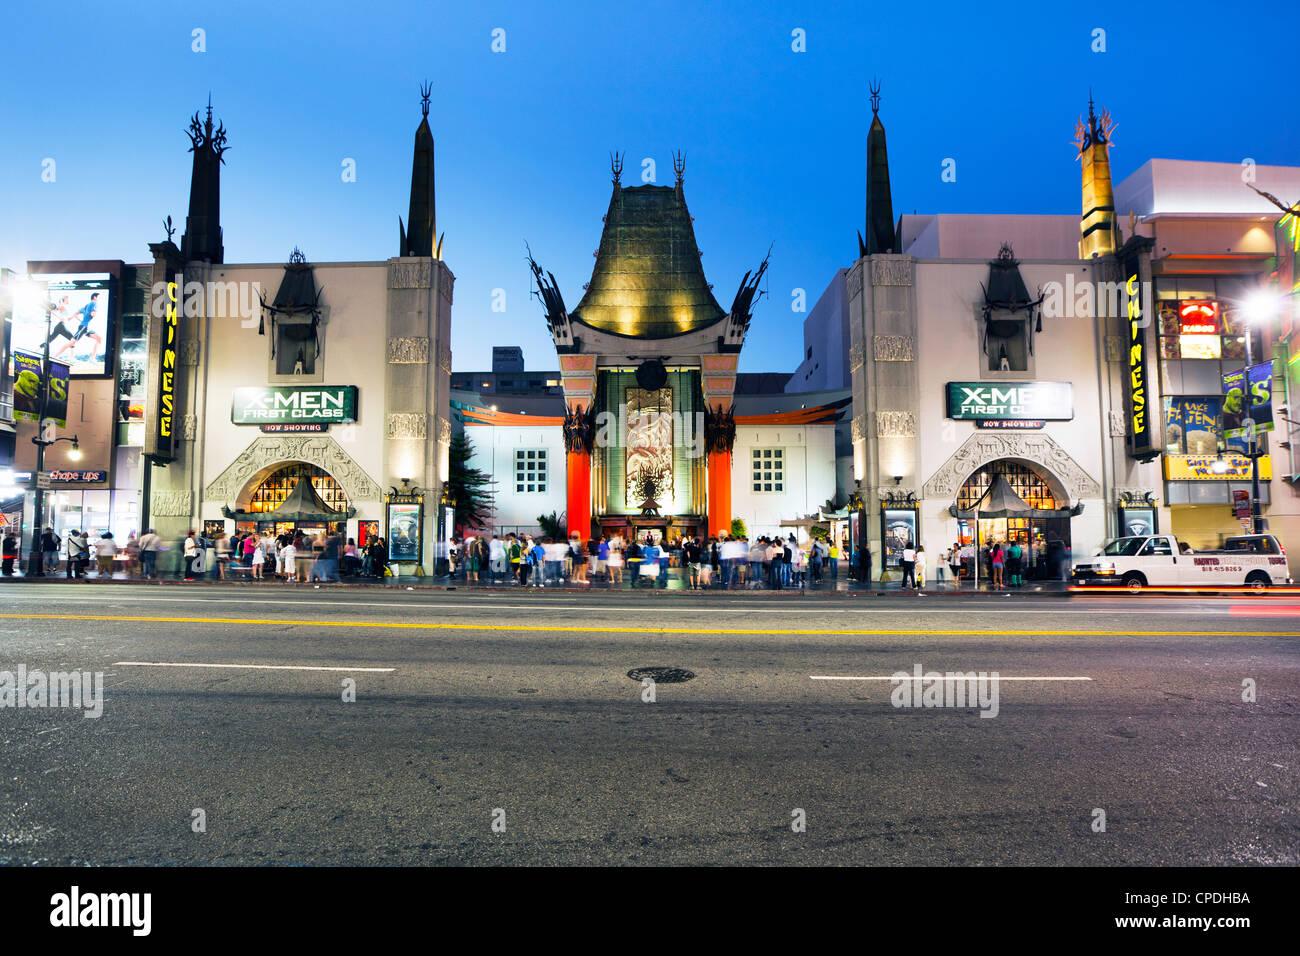 Graumans Chinese Theater, Hollywood Boulevard, Los Angeles, California, Vereinigte Staaten von Amerika, Nordamerika Stockbild